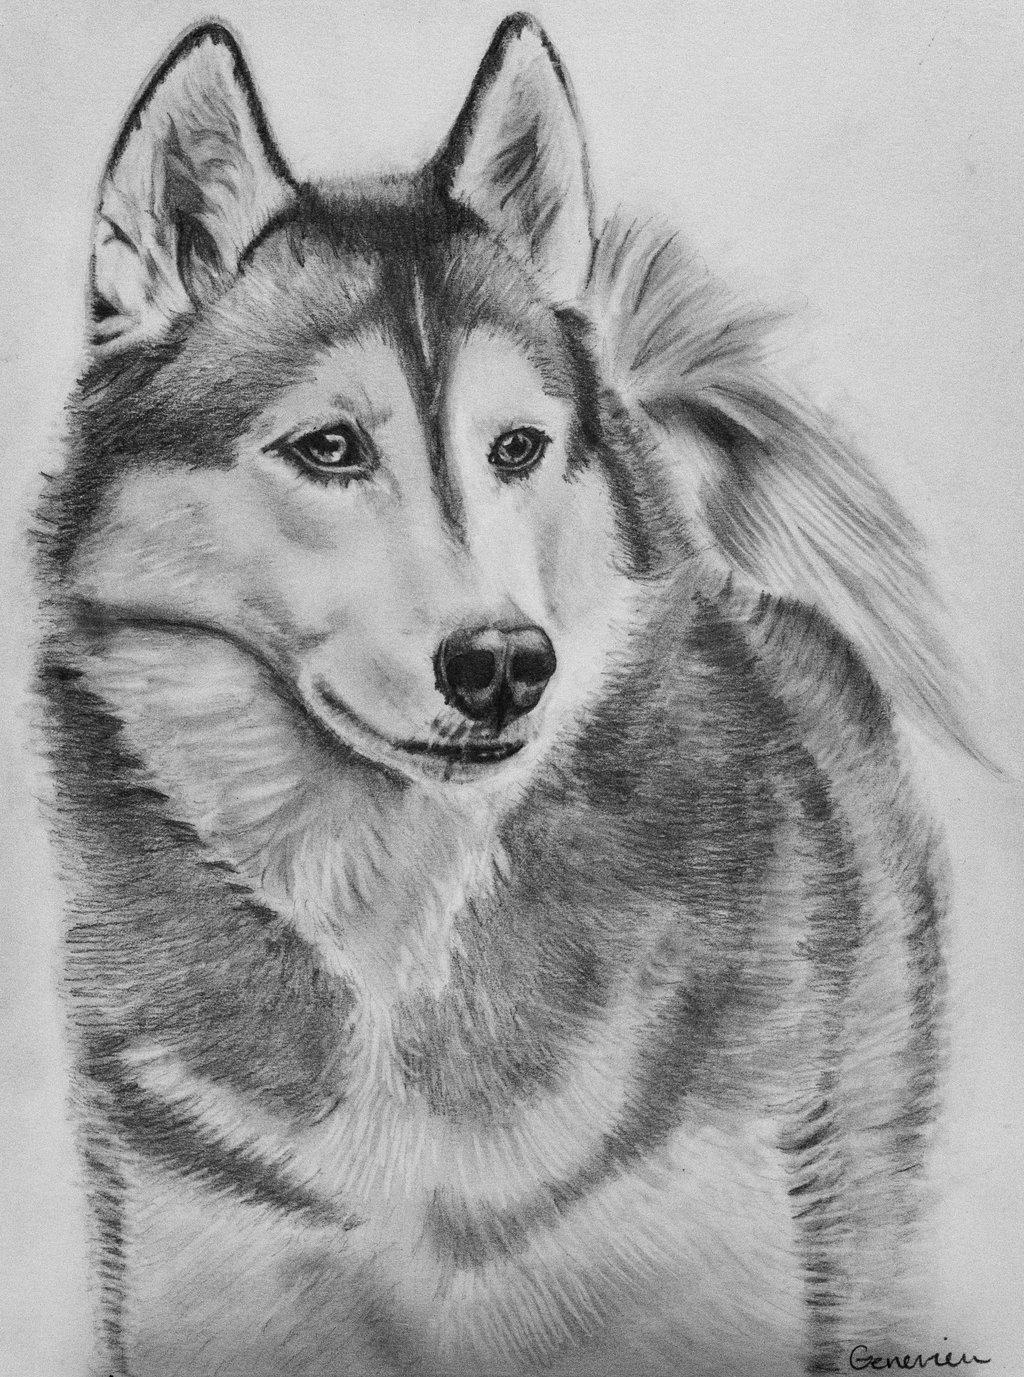 Drawn husky awesome dog Siberian Pinterest tattoos Google Search